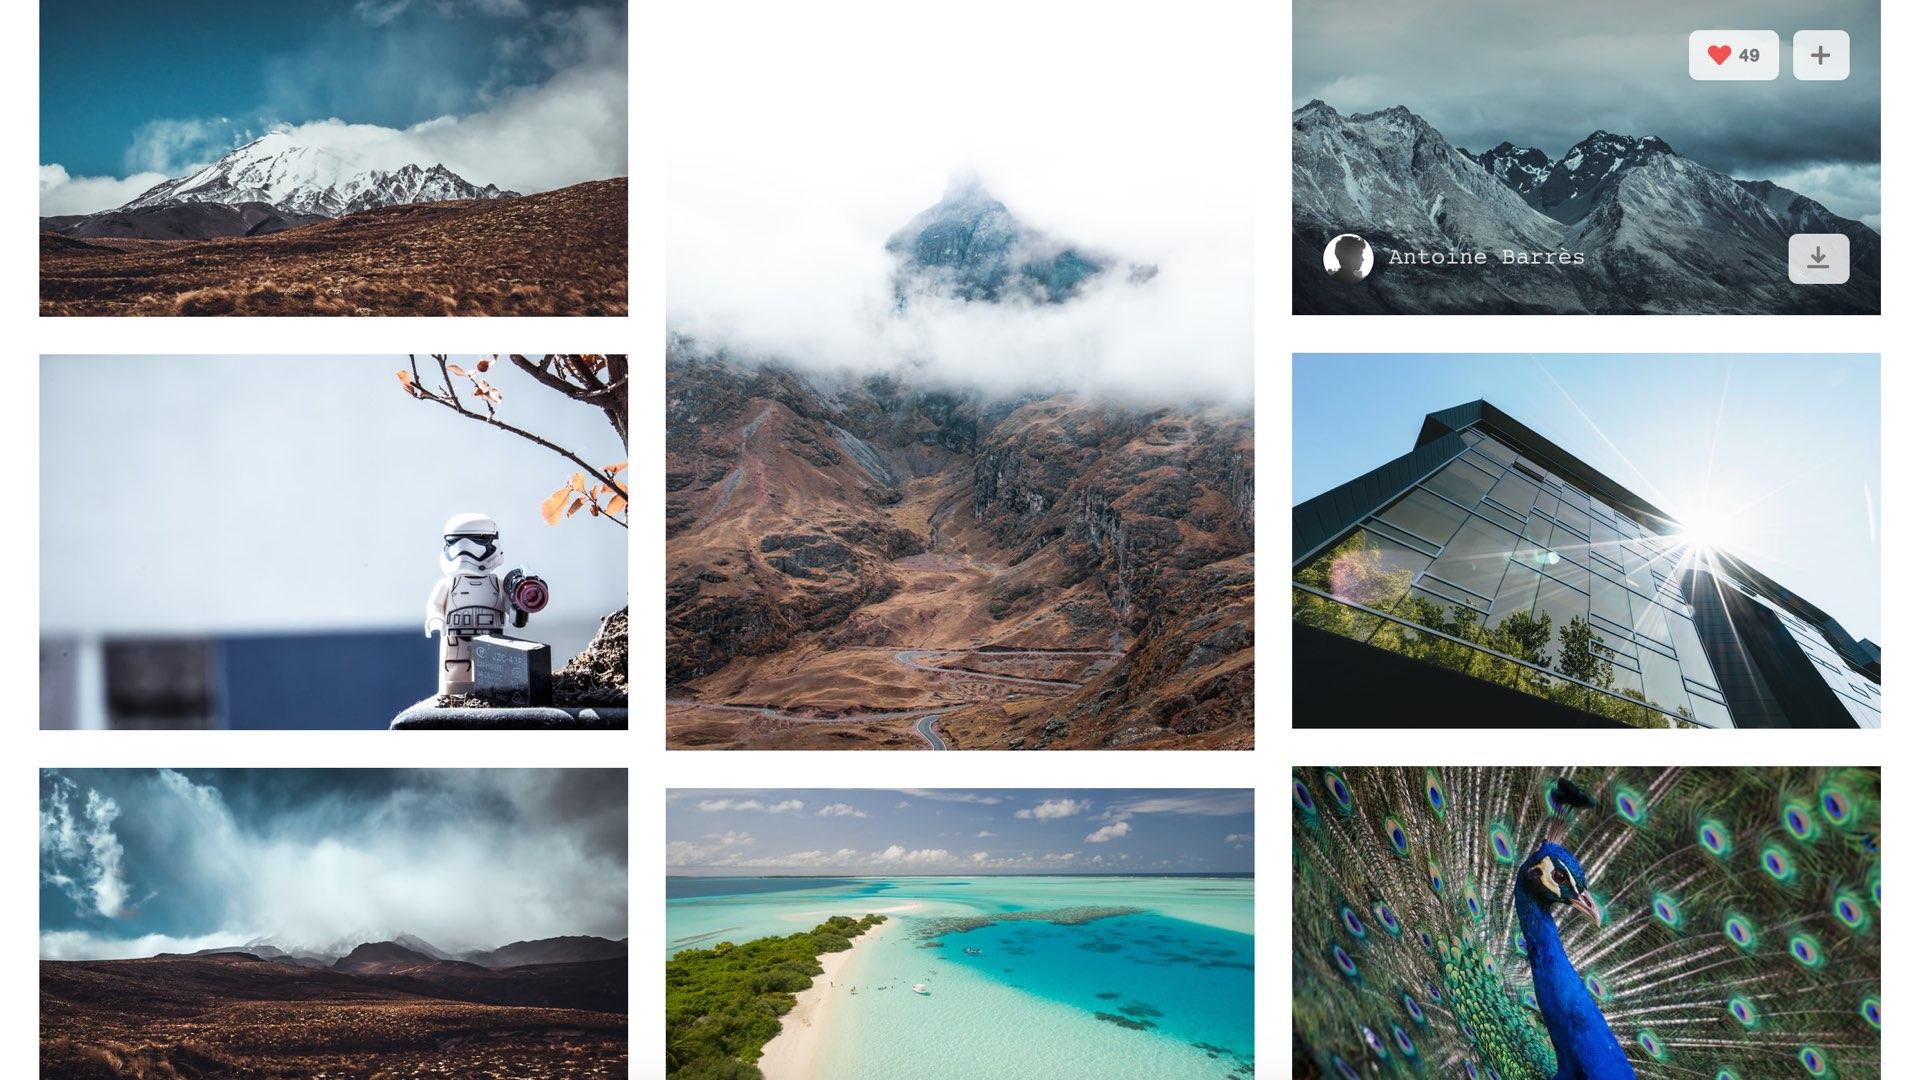 Unsplash   CC0 高解析度攝影圖庫,支援商業用途,無需費用,主題性多元